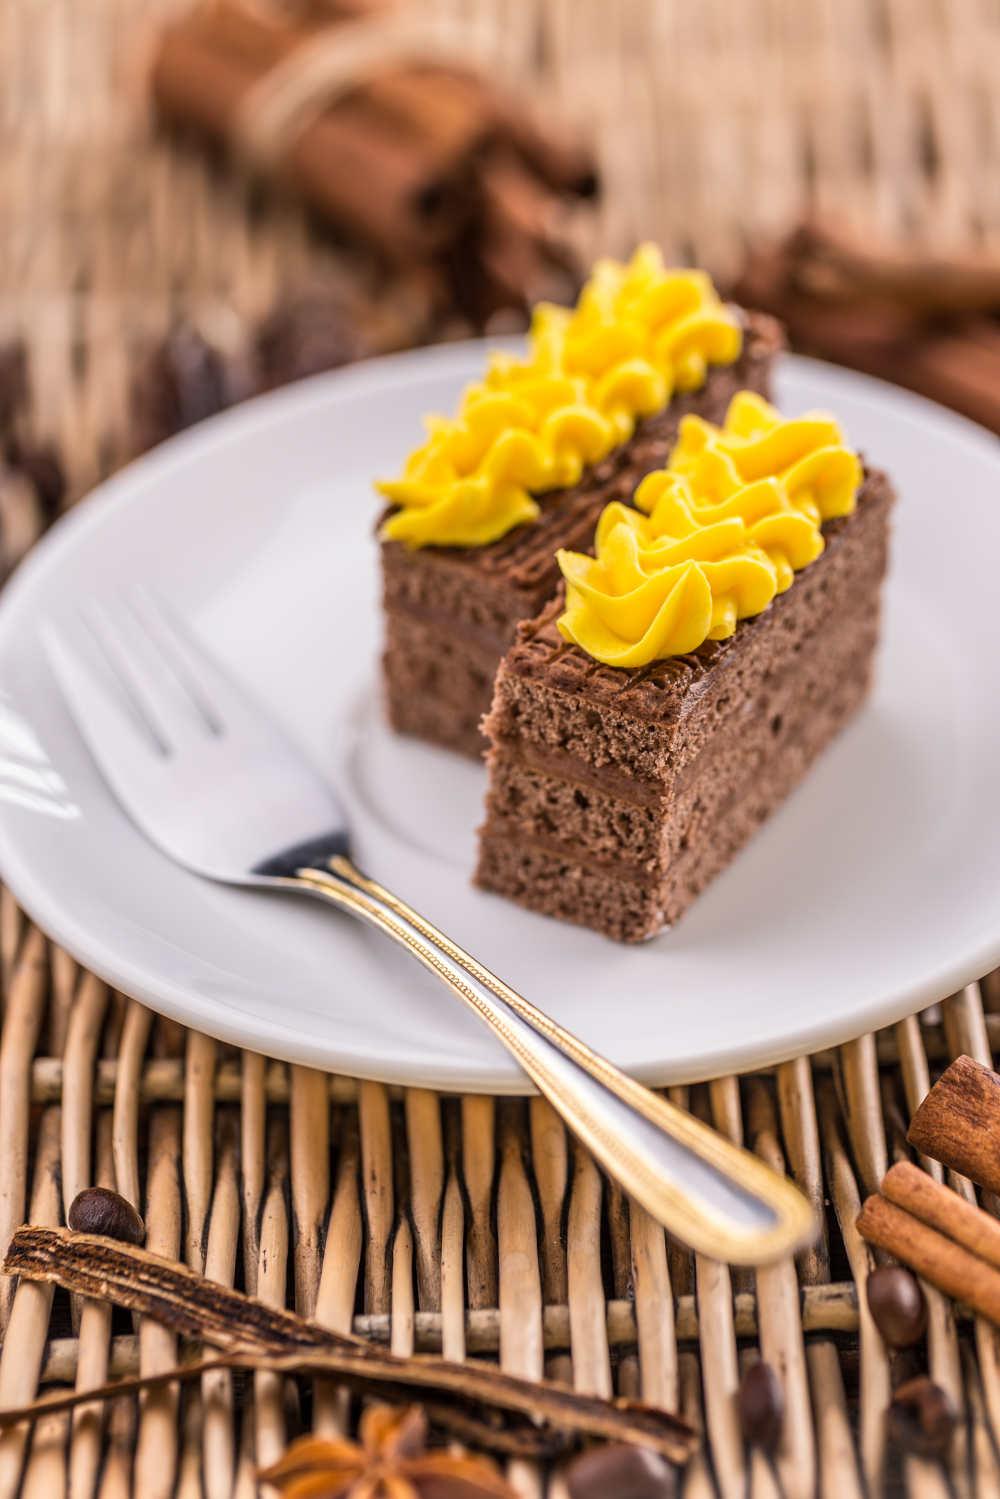 cakes-PLXJADX.jpg